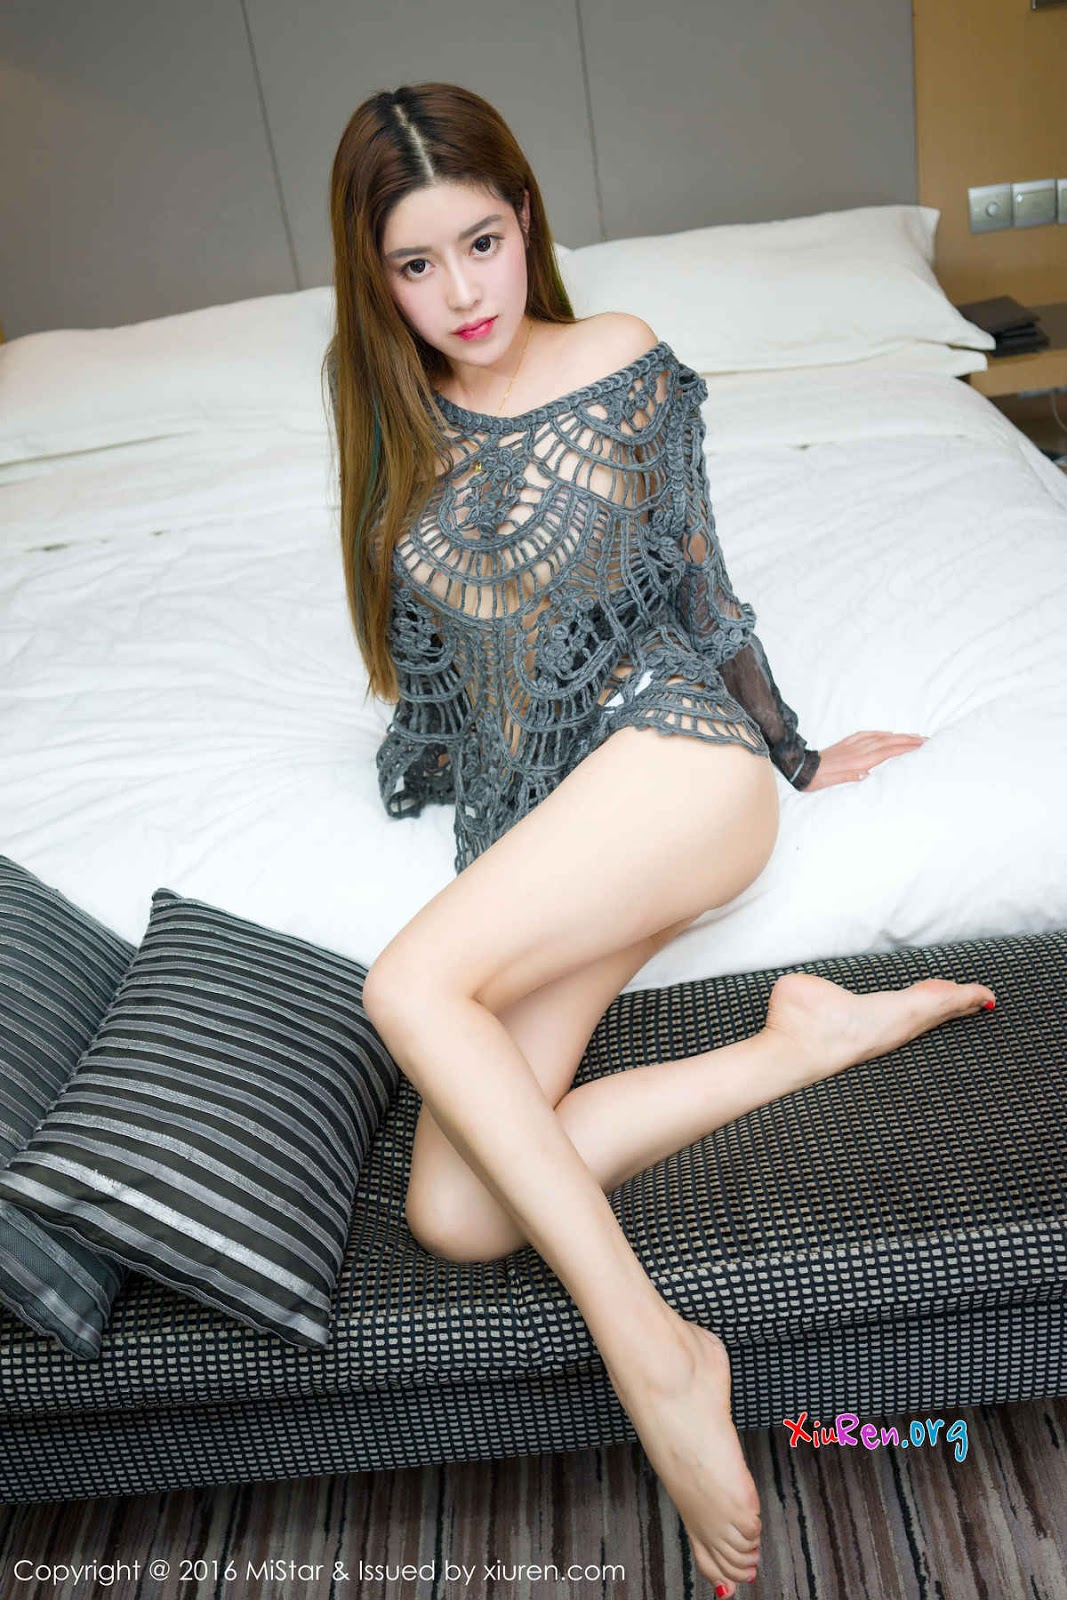 https://1.bp.blogspot.com/-ntn3wFnjuJg/WHrz4y4ADhI/AAAAAAAAO1I/iAJcwPsDczkb2py0nyl9nr4wEAgPwTGZQCLcB/s1600/xinh-sexy-17.jpg